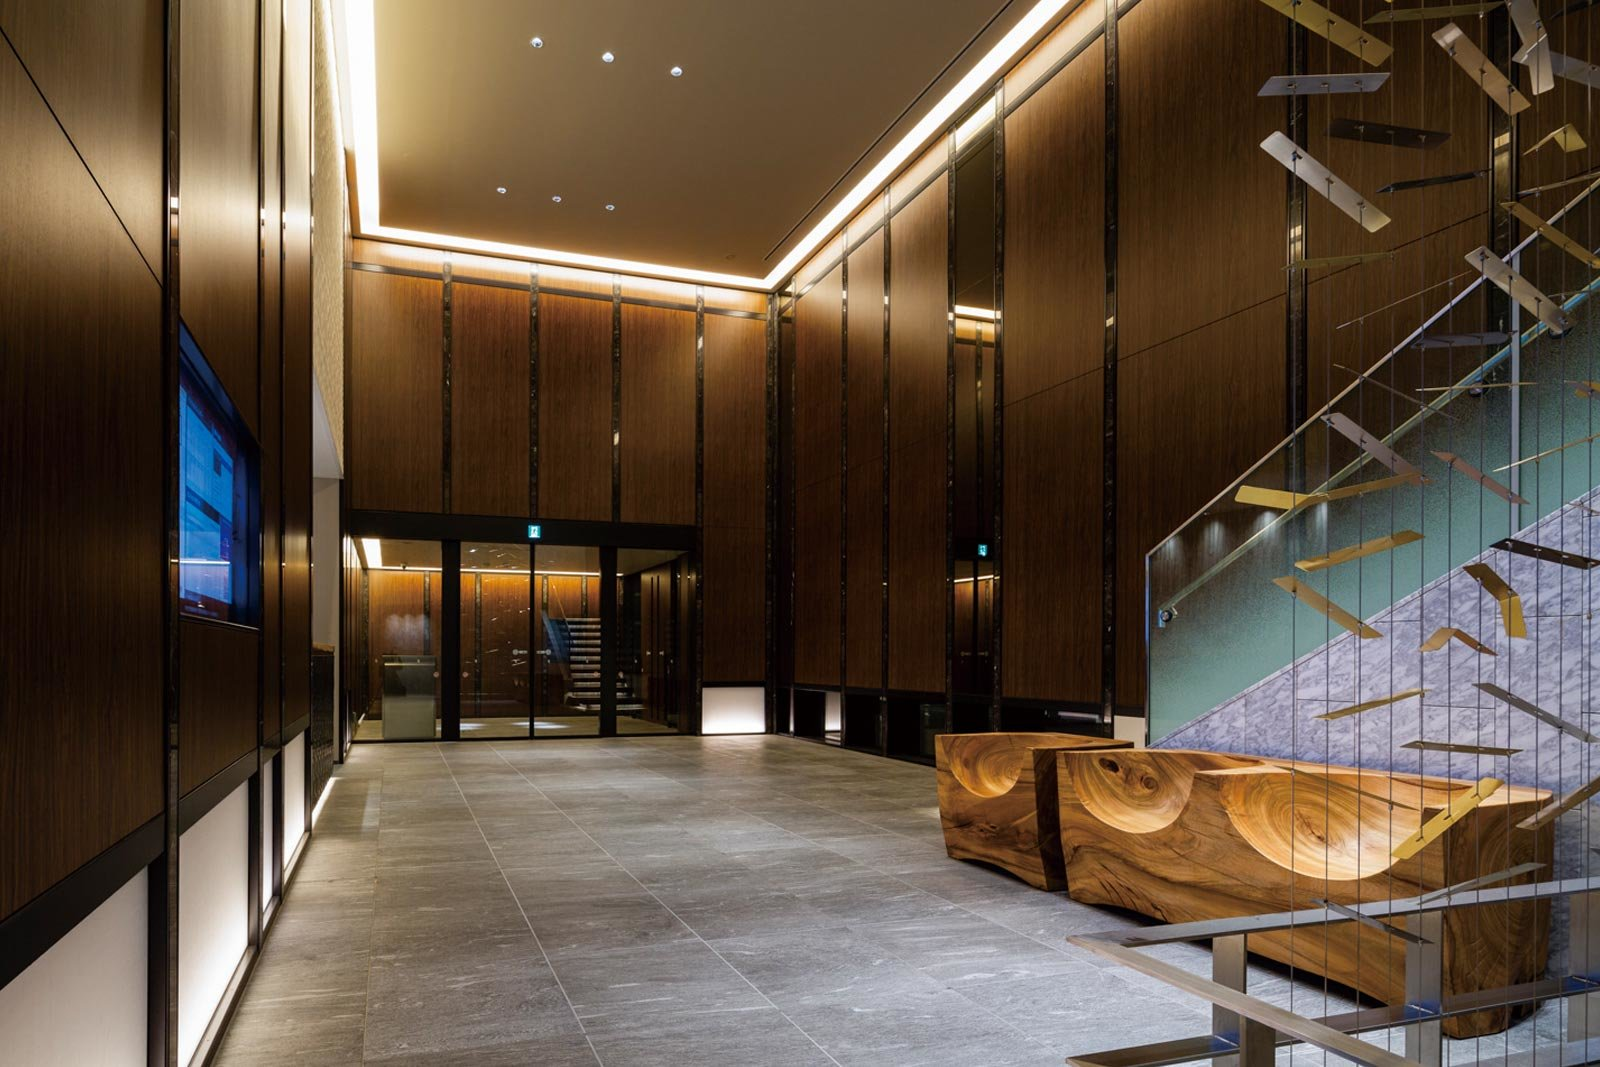 entrance-hall01_tower-yoyogikoen-classy.jpg